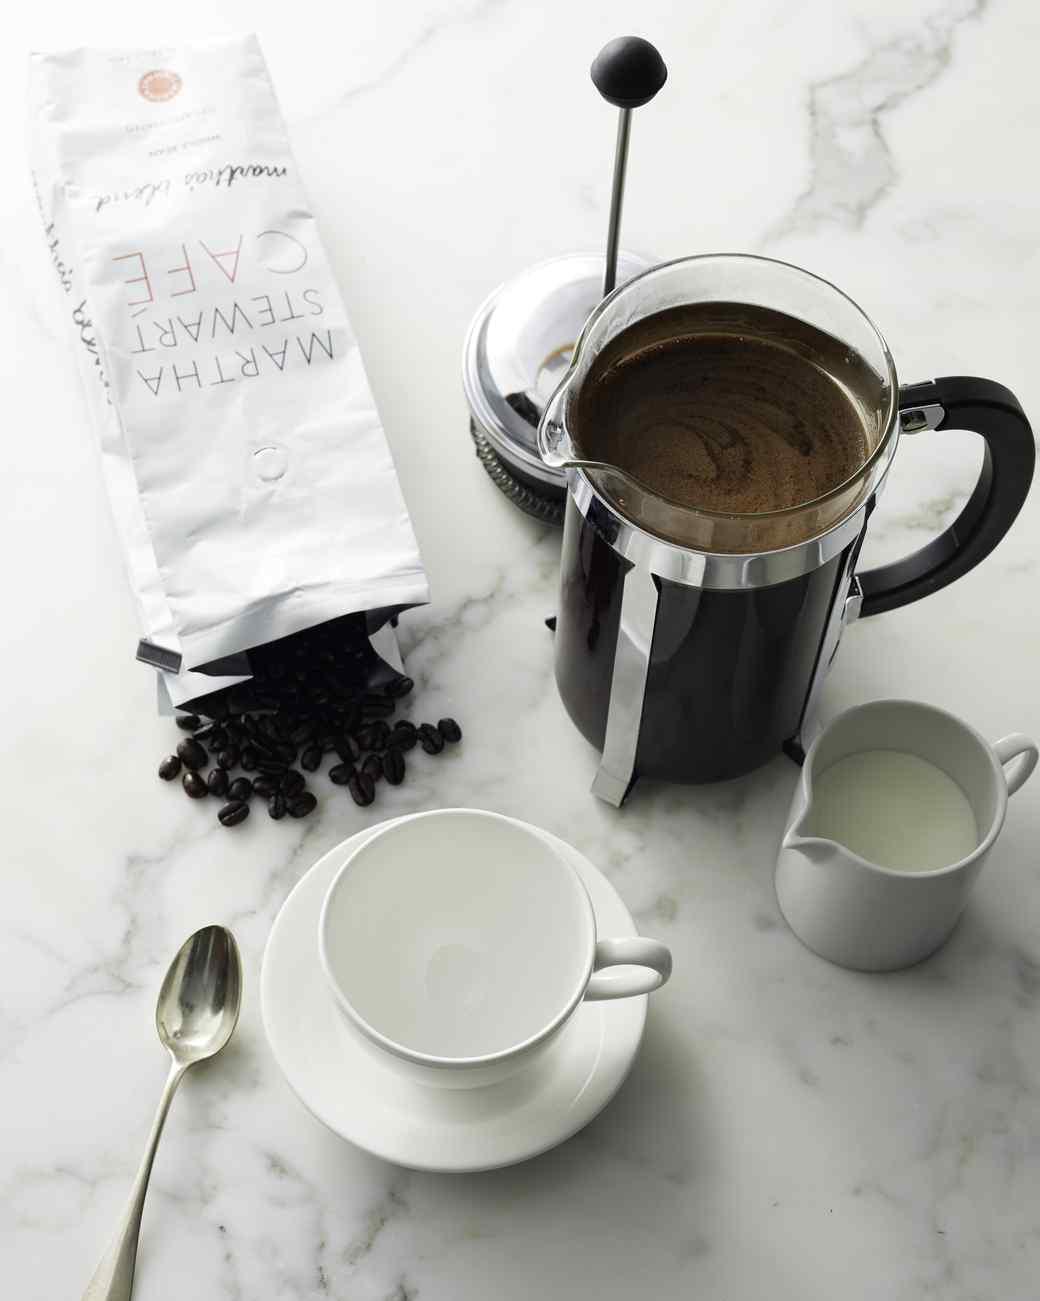 martha stewart cafe coffee bag and french press